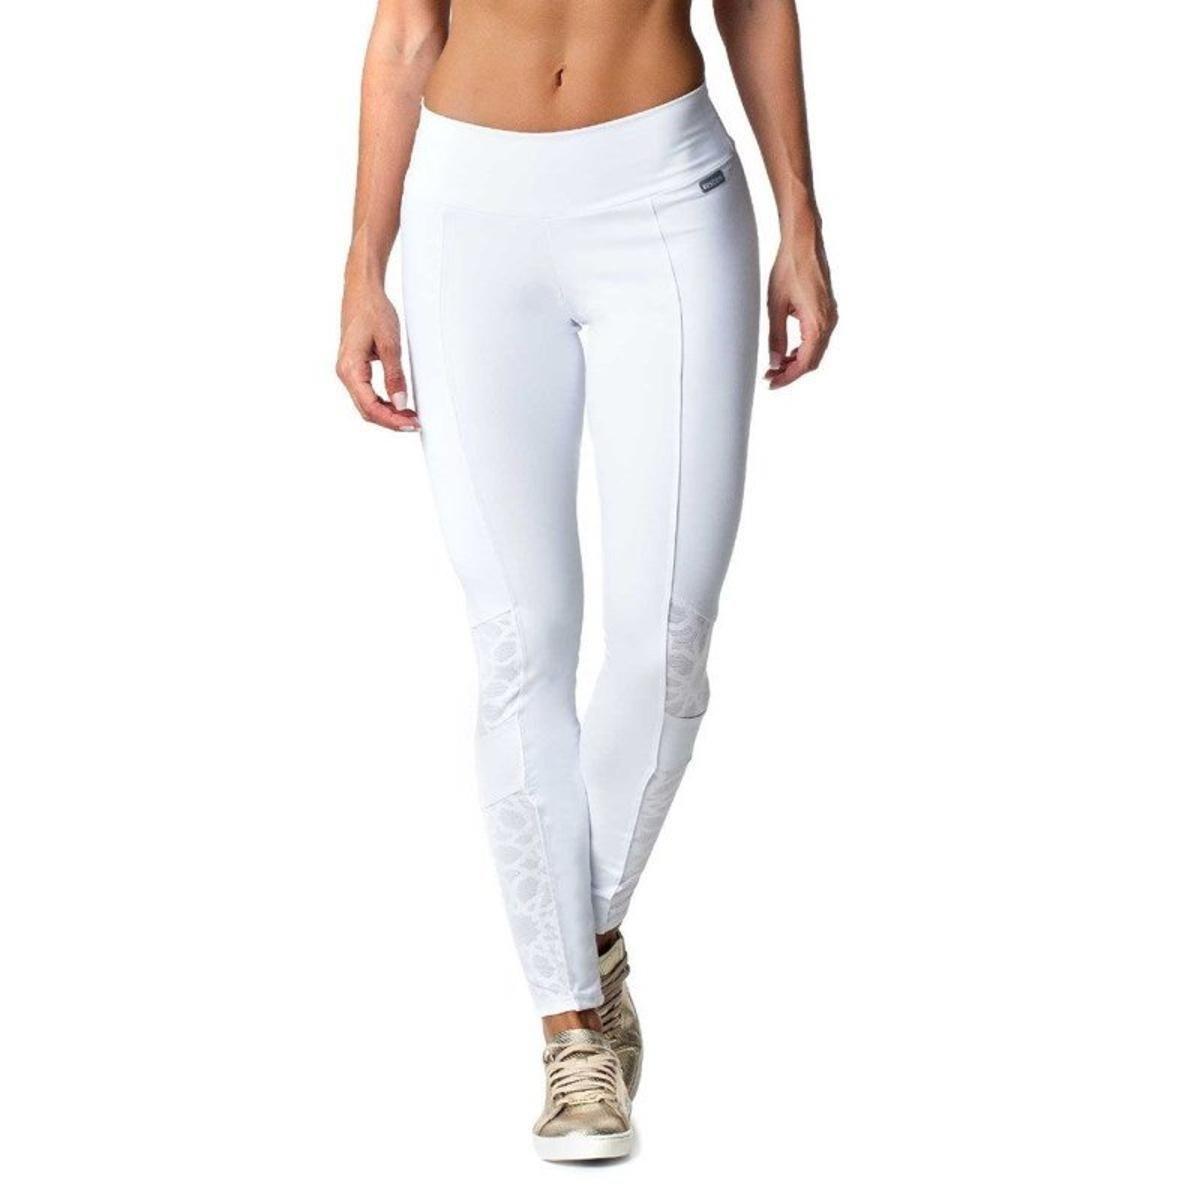 Calça 383 Fuso Mandala 383 Fuso Vestem Branco Calça Mandala Pqp4PnCU